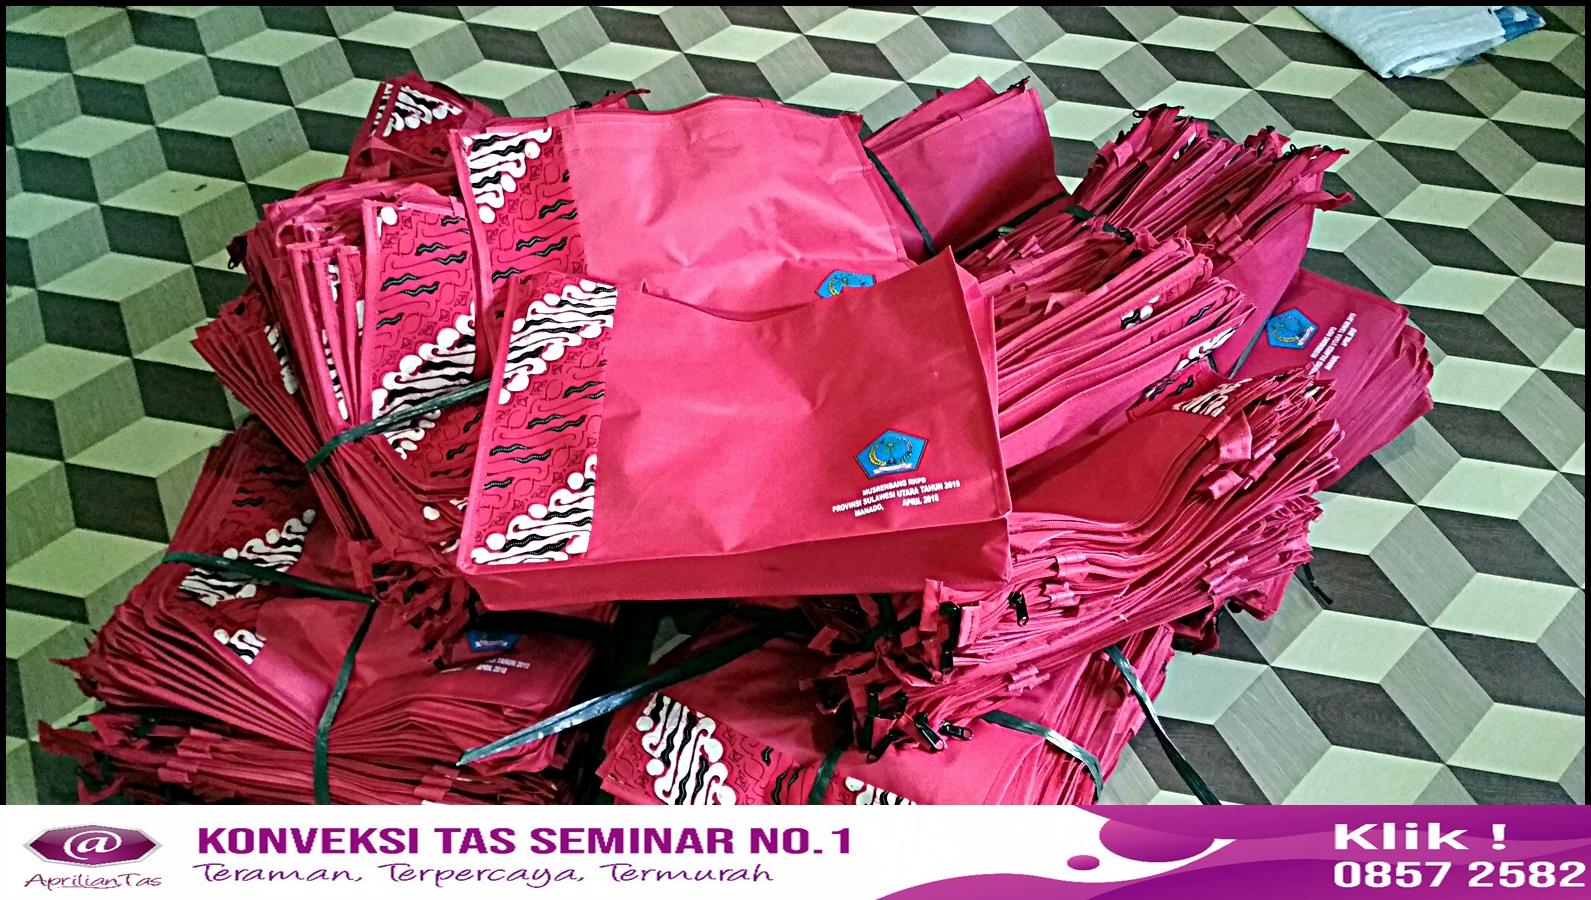 Tas Seminar Murah Model Ransel Slempang Totebag Motif Batik Harga Murah Bandung Tas seminar solo,tas seminar kit,tas seminar aceh,tas seminar banda aceh, konveksi tas bandung,konveksi tas ransel,konveksi tas seminar,